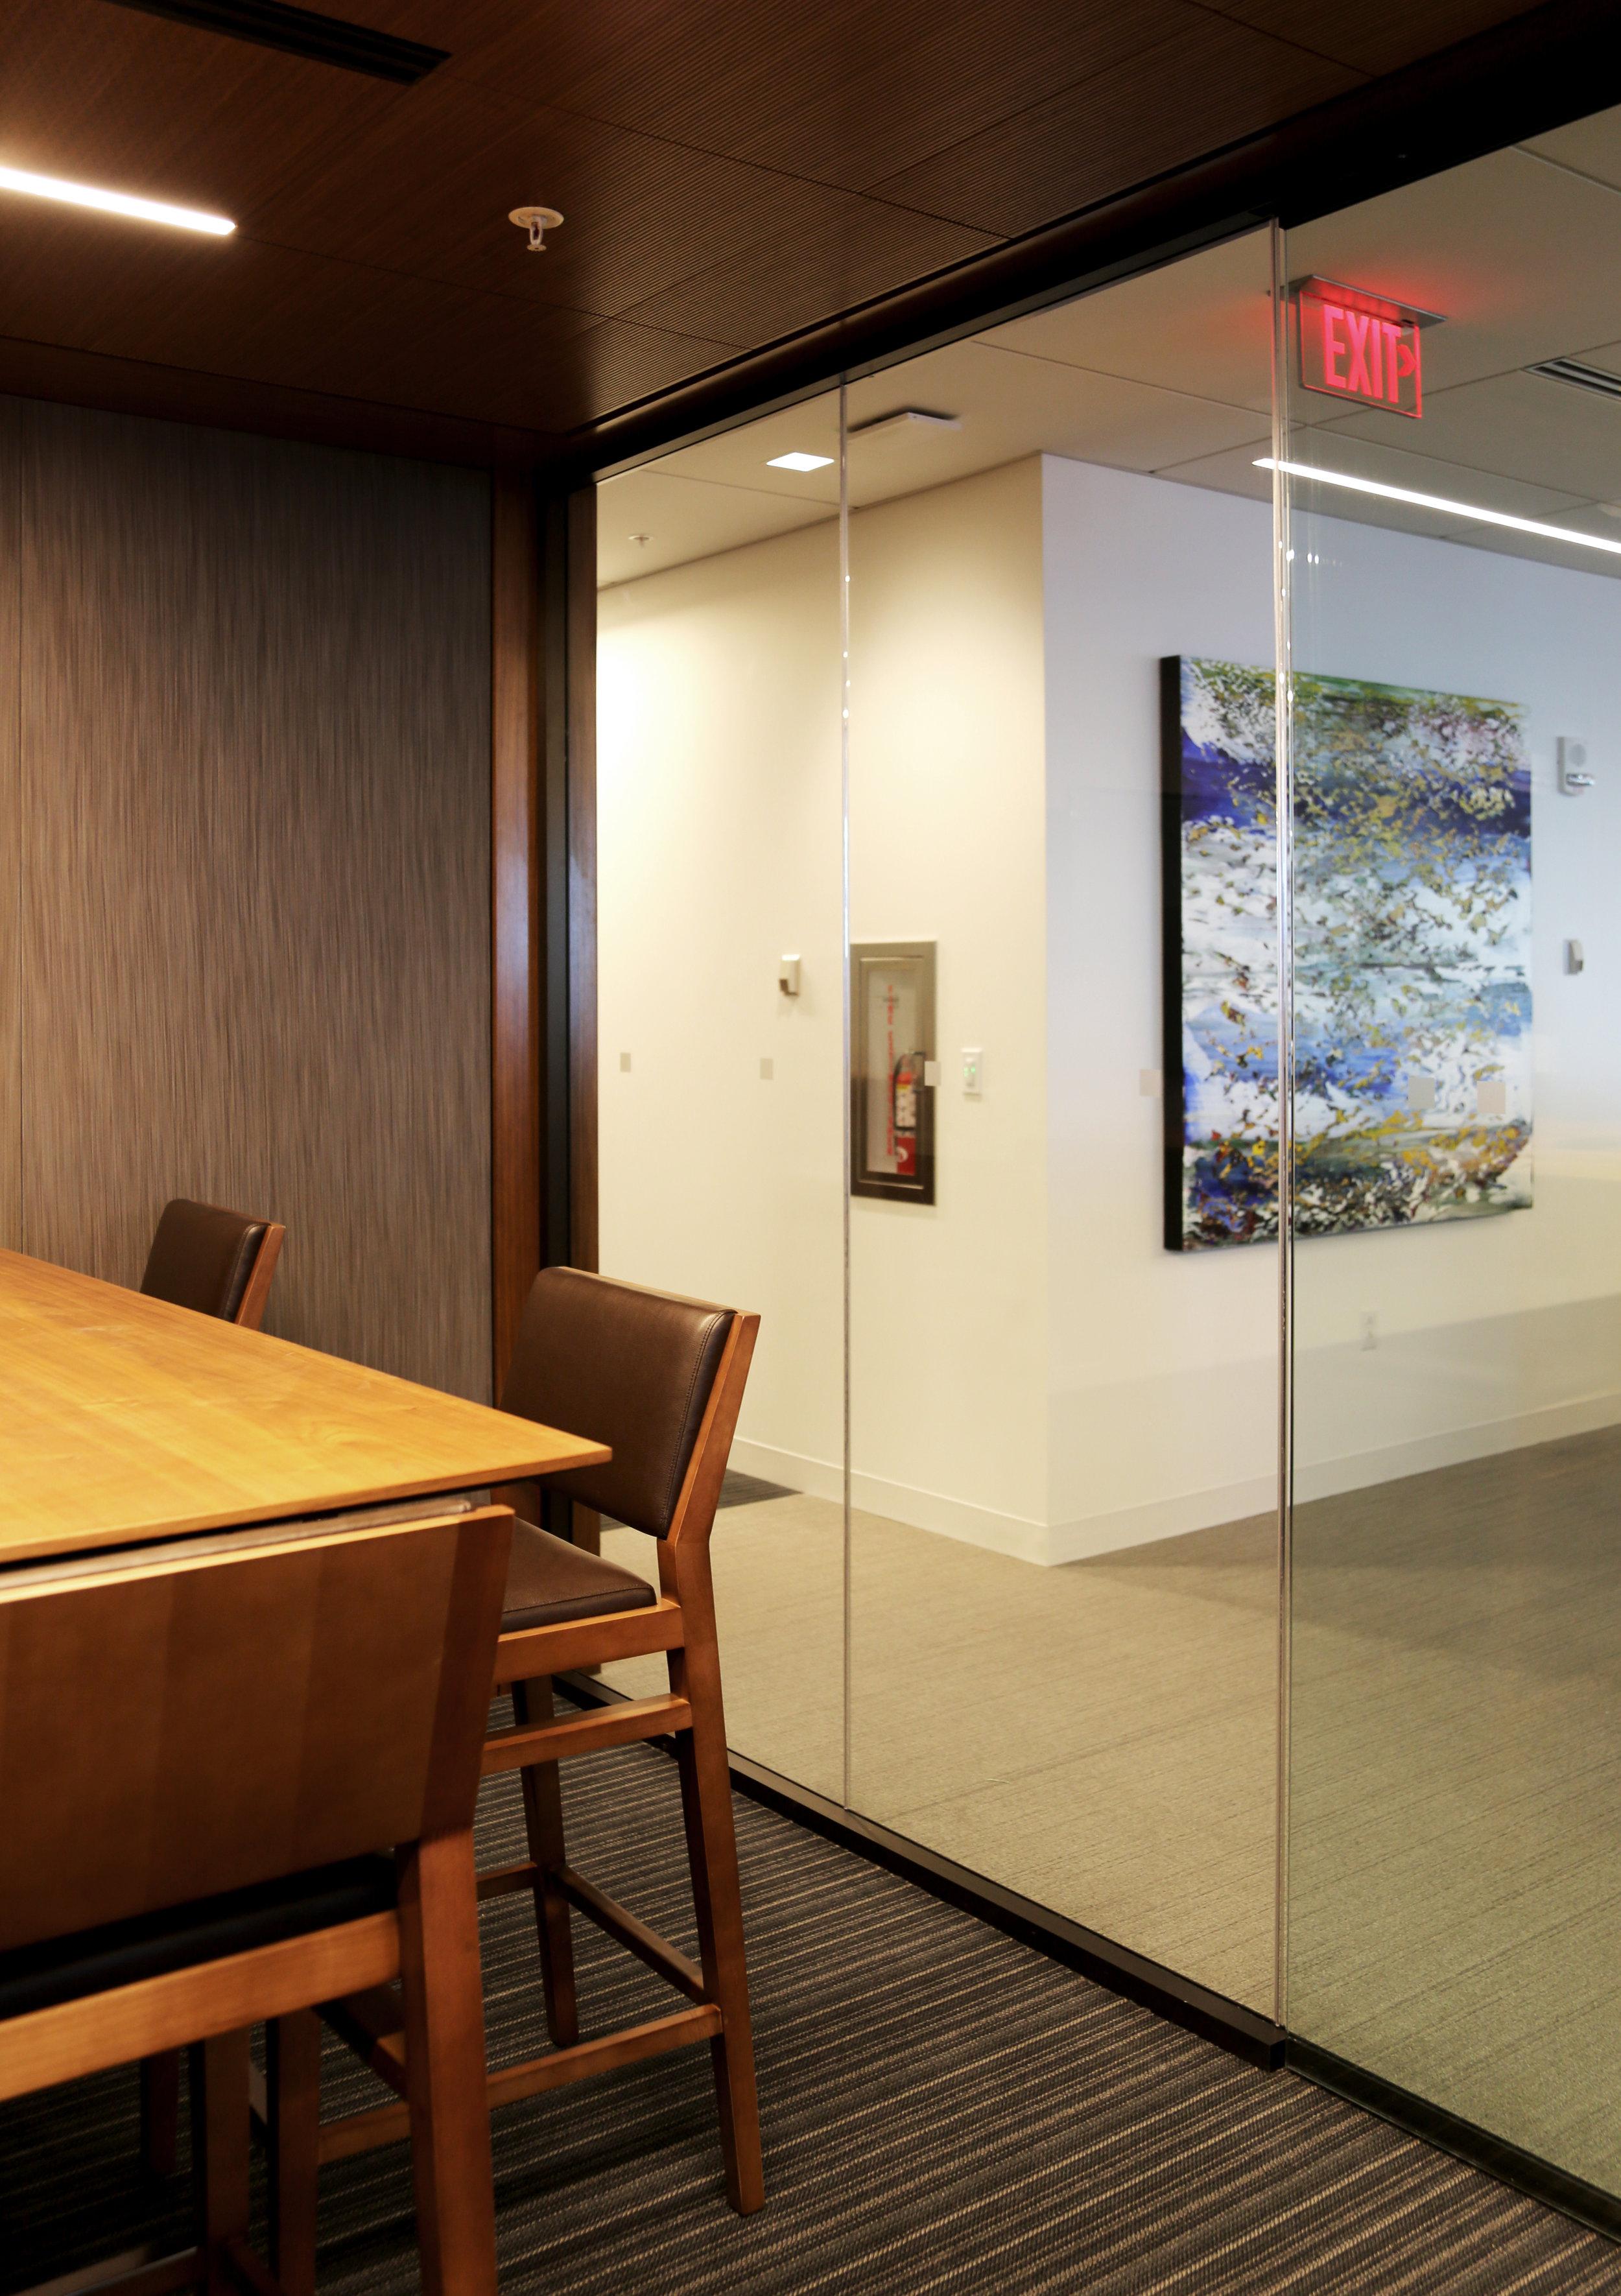 Modernus Glass Wall System - Spaceworks AI.jpg